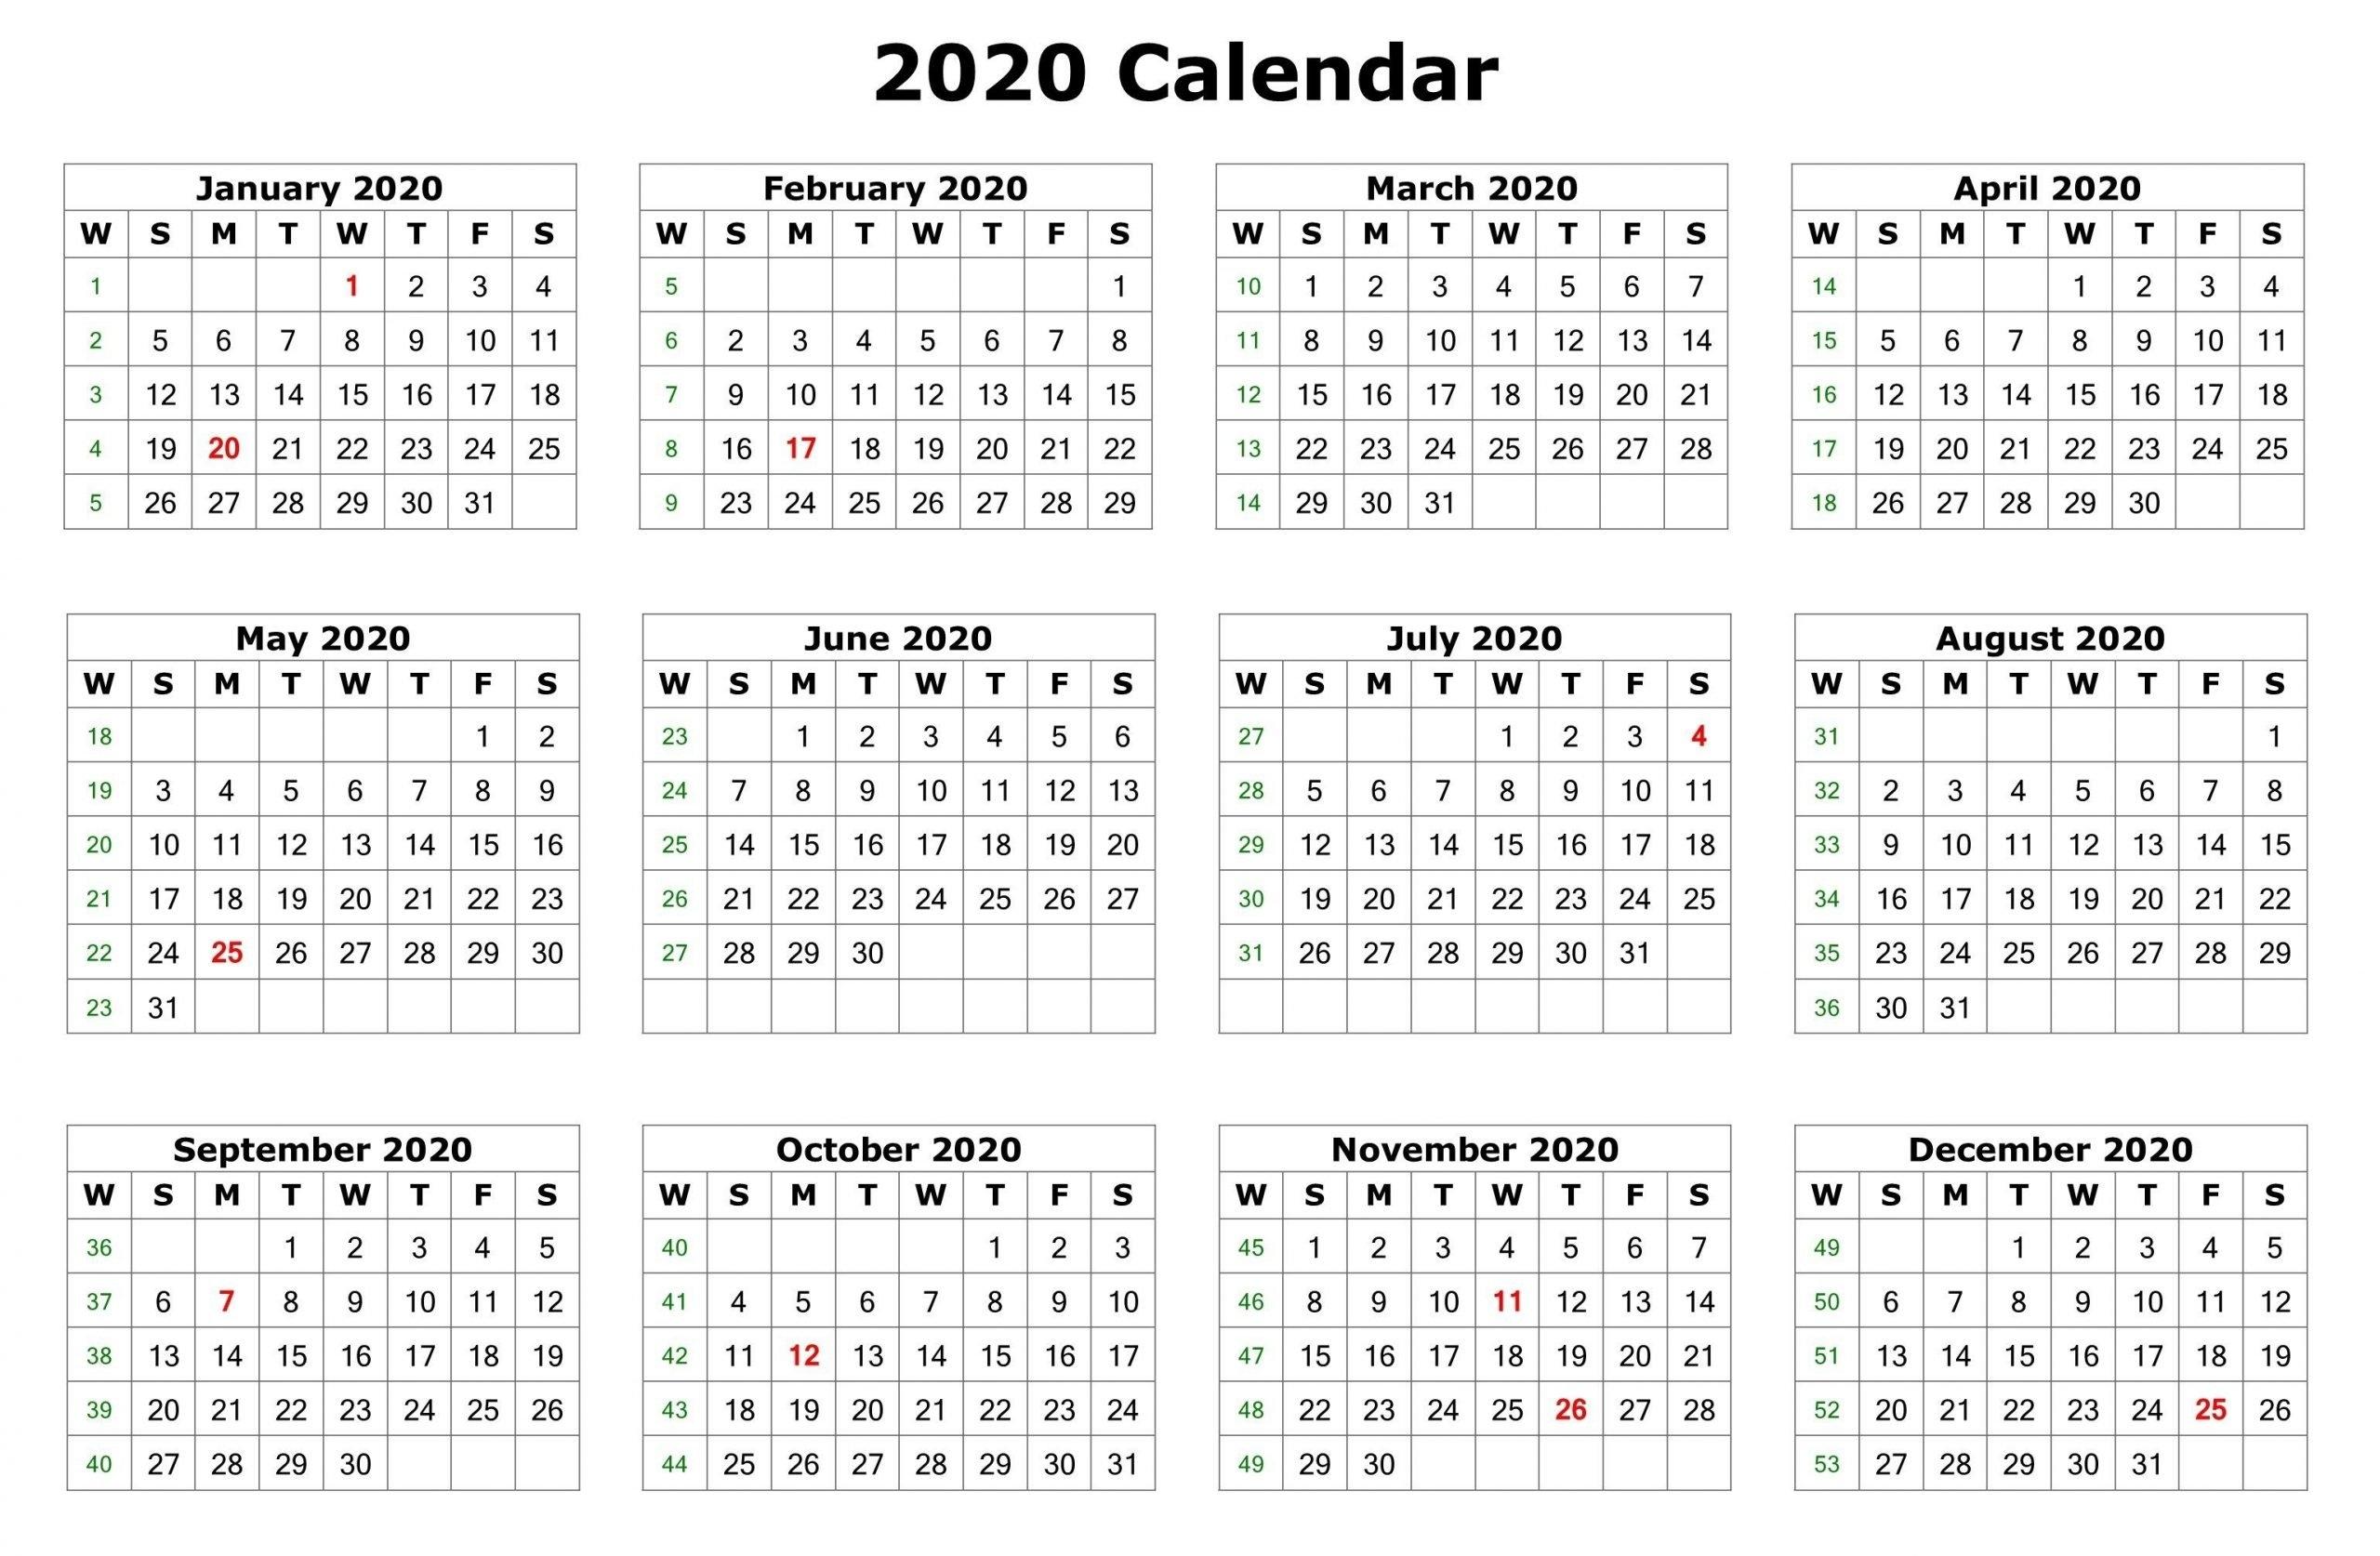 Get 8X11 Printable 2020 Calendar   Calendar Printables Free Blank within Broadcast Calendar 2021 Printable